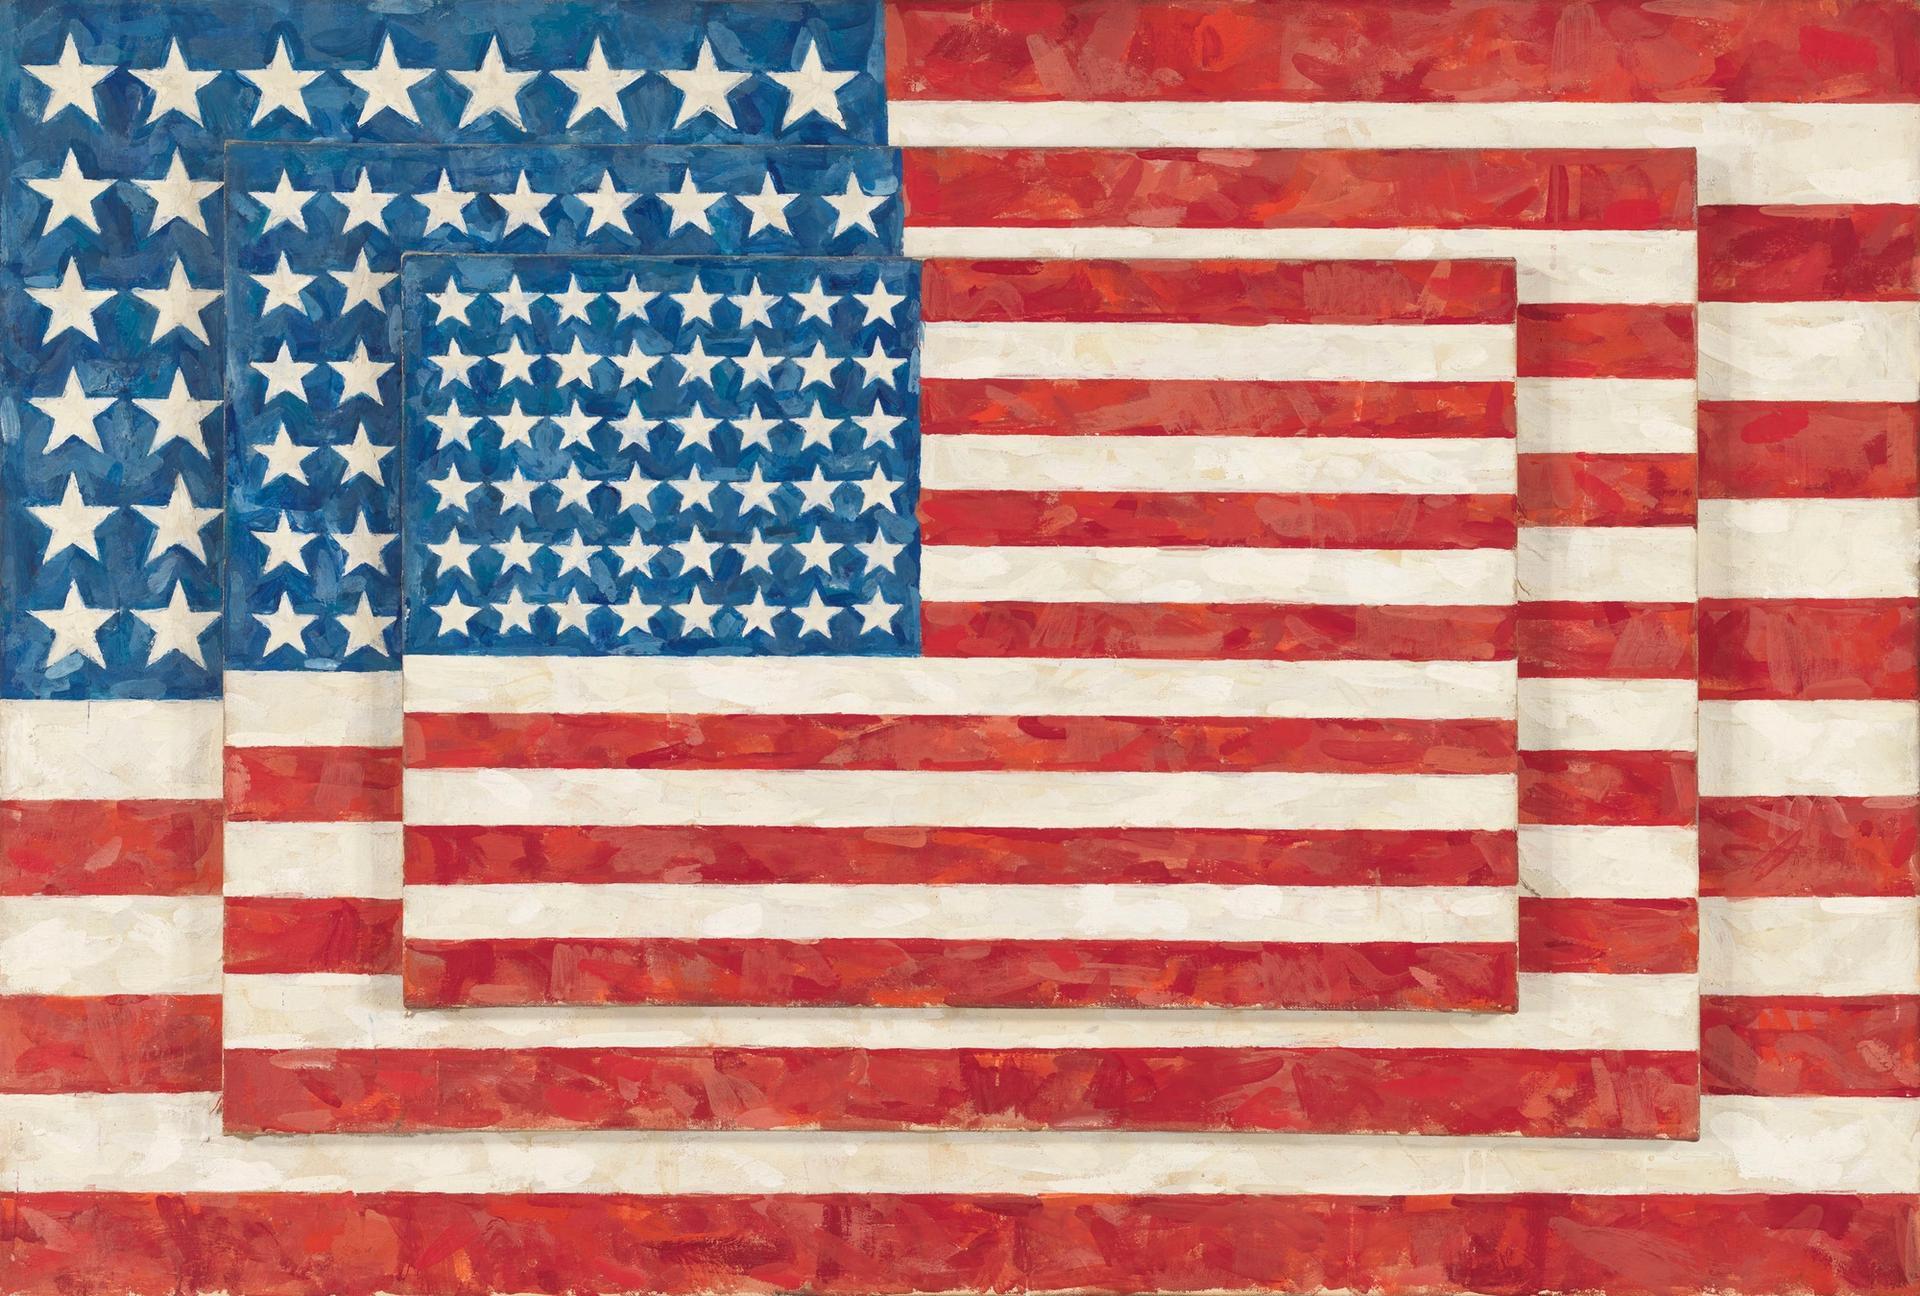 Jasper Johns's Three Flags (1958). © 2021 Jasper Johns / Licensed by VAGA at Artists Rights Society (ARS), NY